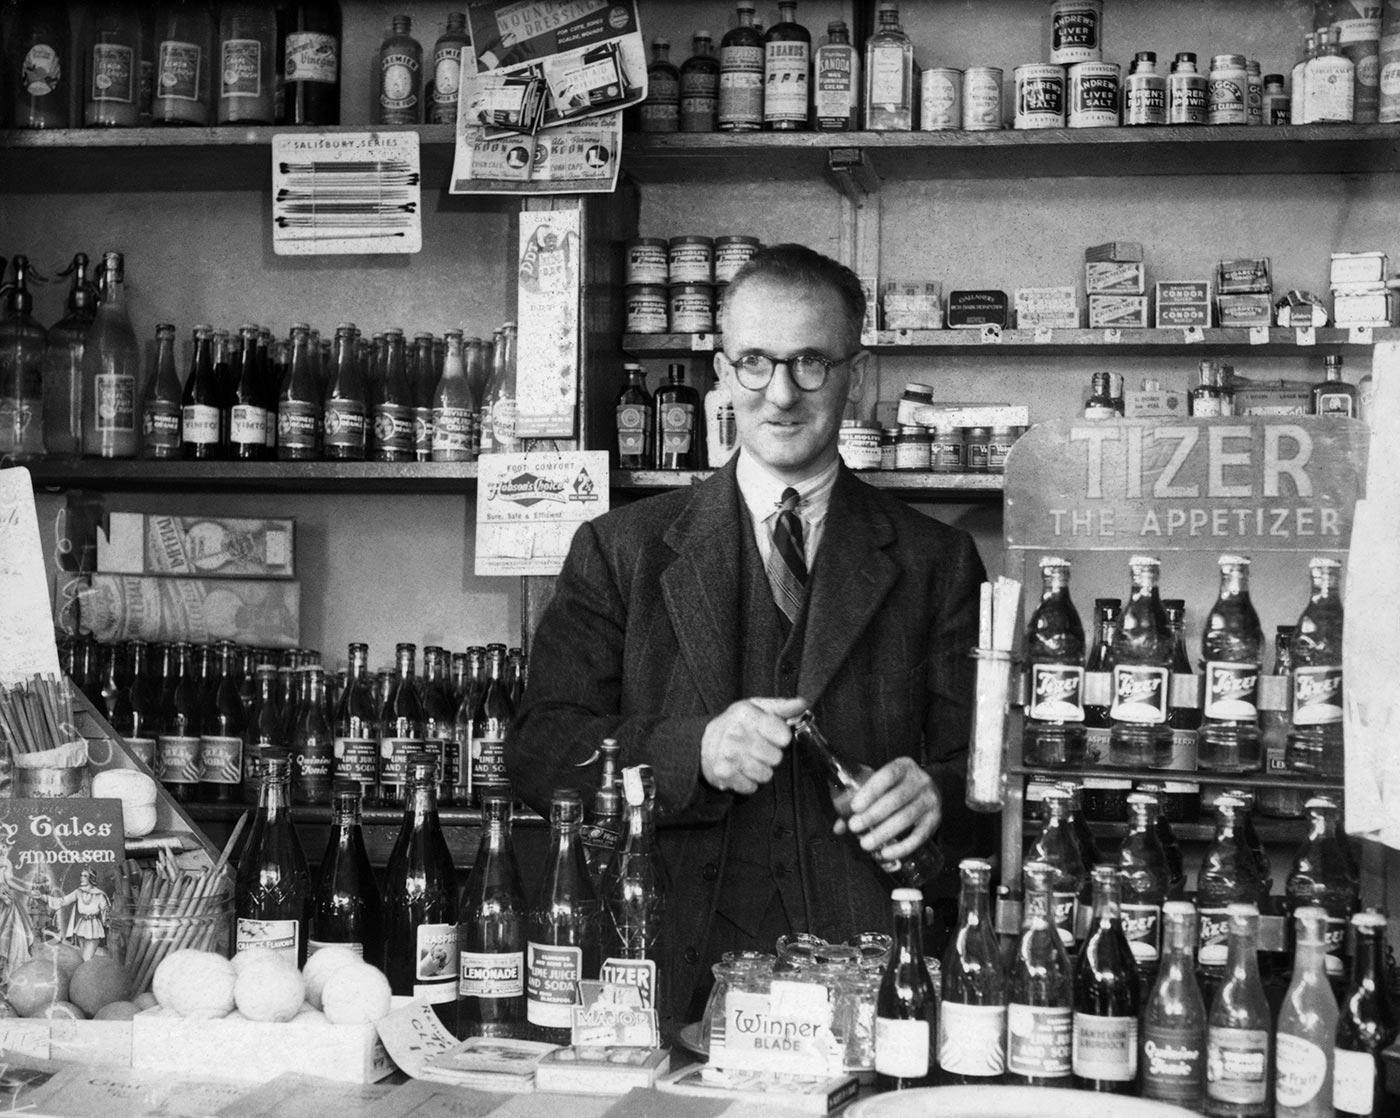 Harold Larwood behind the counter of his sweet shop